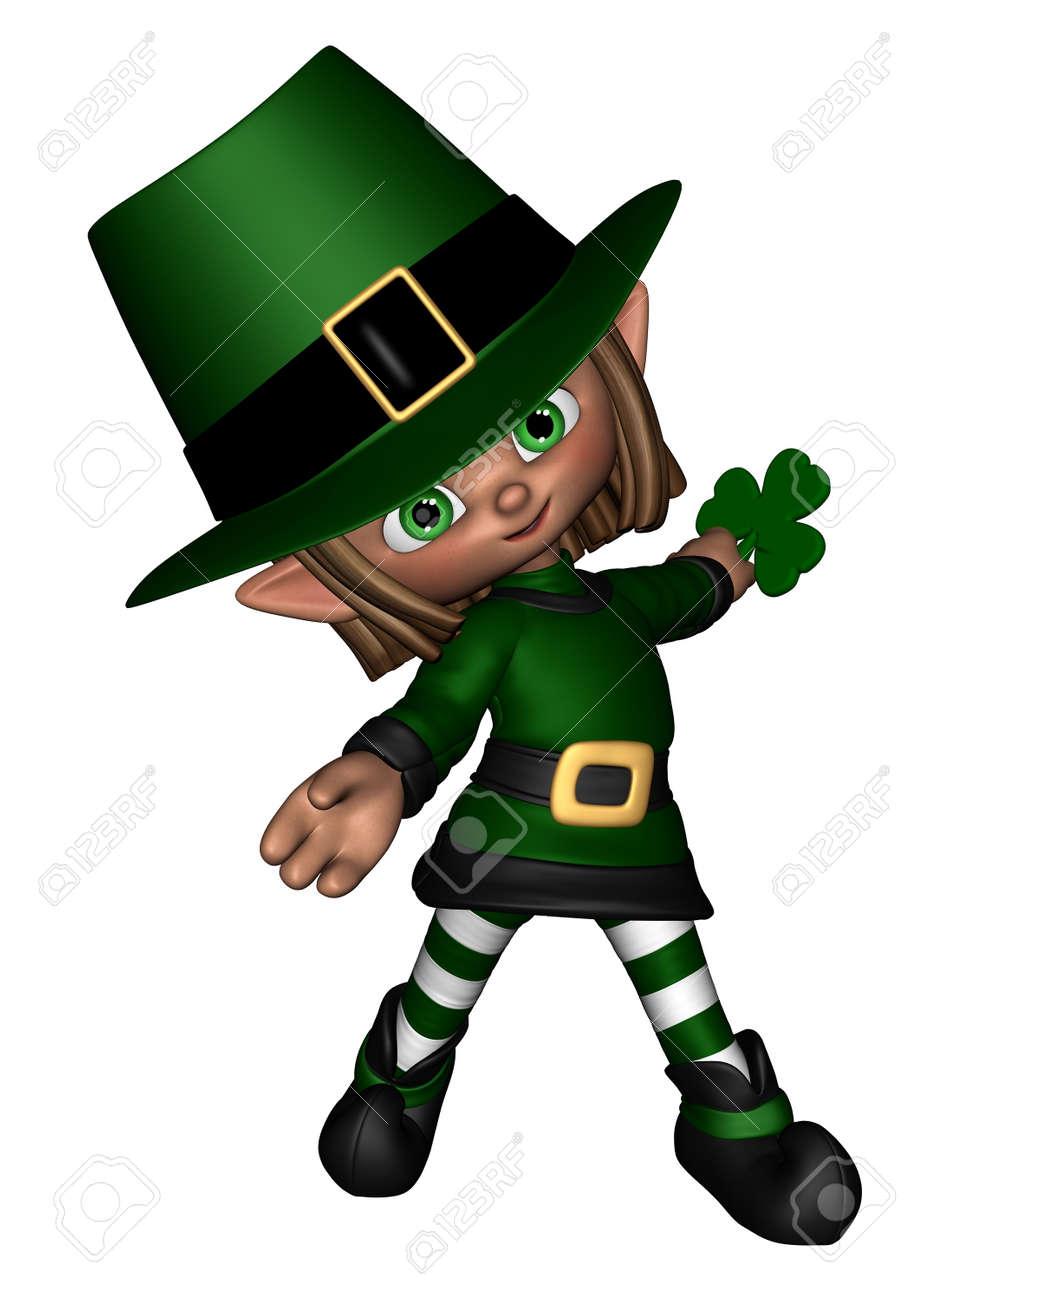 Cute toon Irish leprechaun holding a shamrock leaf for St Patrick s Day 3d  sc 1 st  123RF.com & Cute Toon Irish Leprechaun Holding A Shamrock Leaf For St Patrick ...